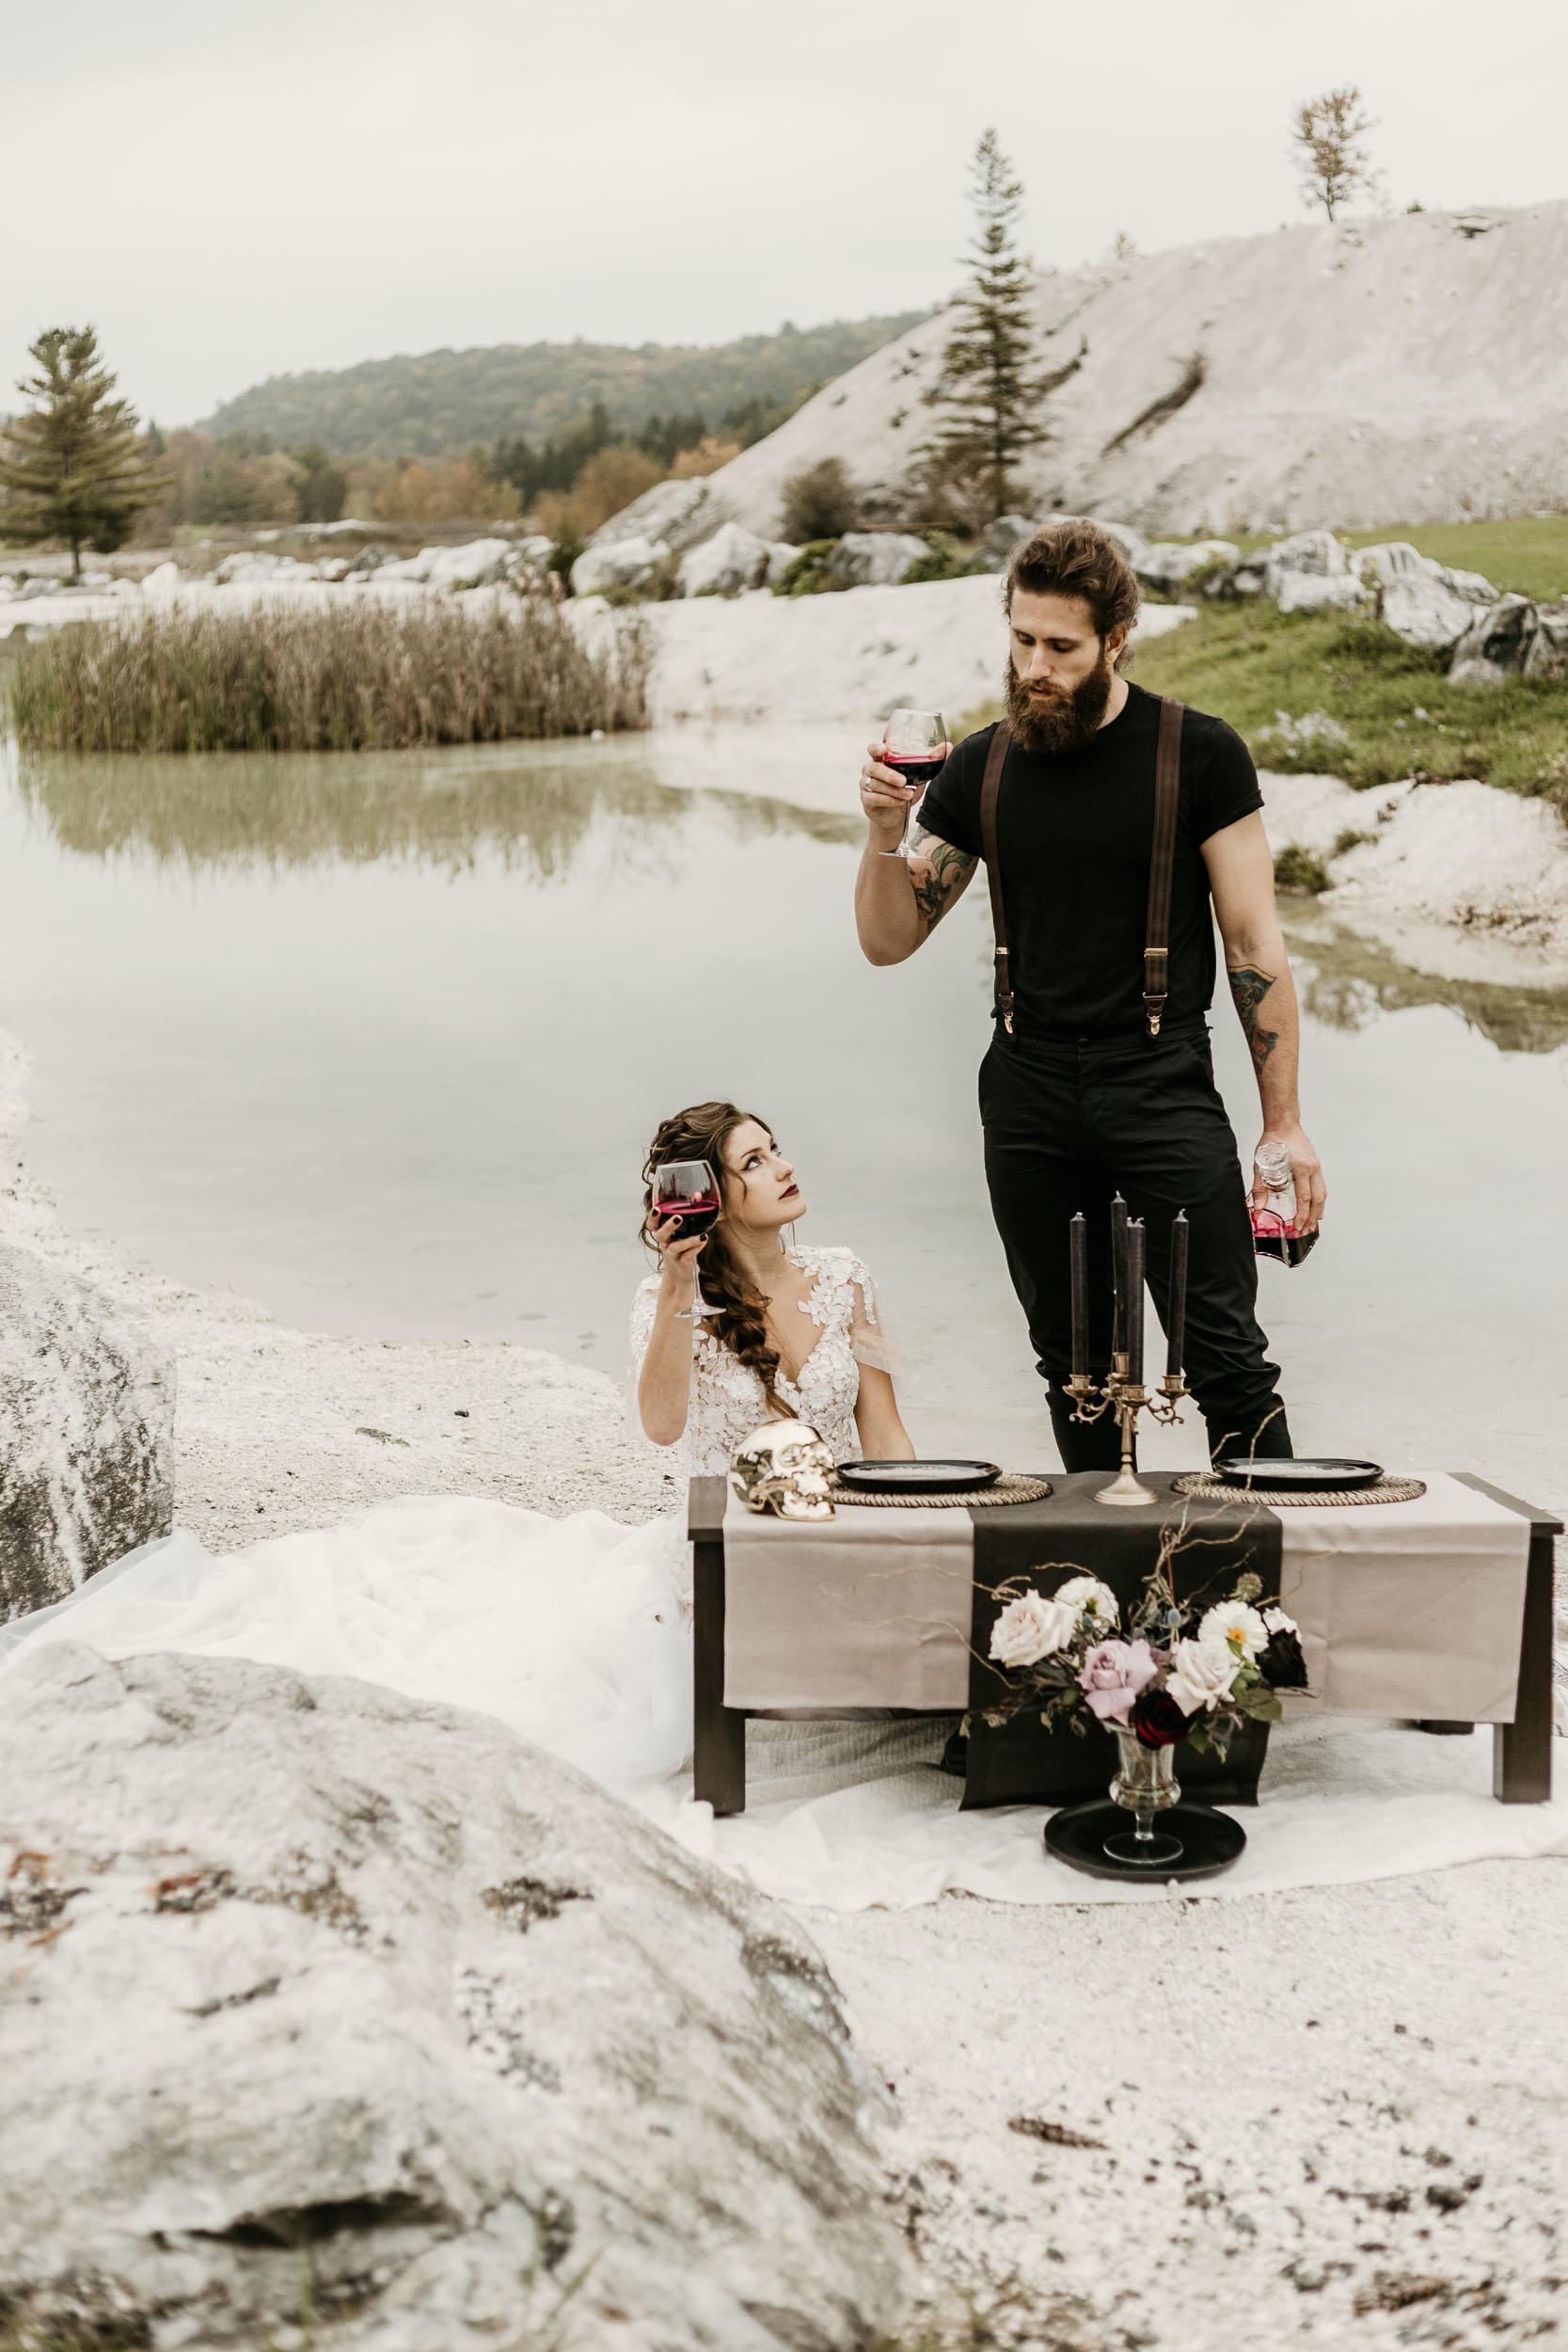 intimate-wedding-elopement-photographer-ottawa-toronto-0843.jpg